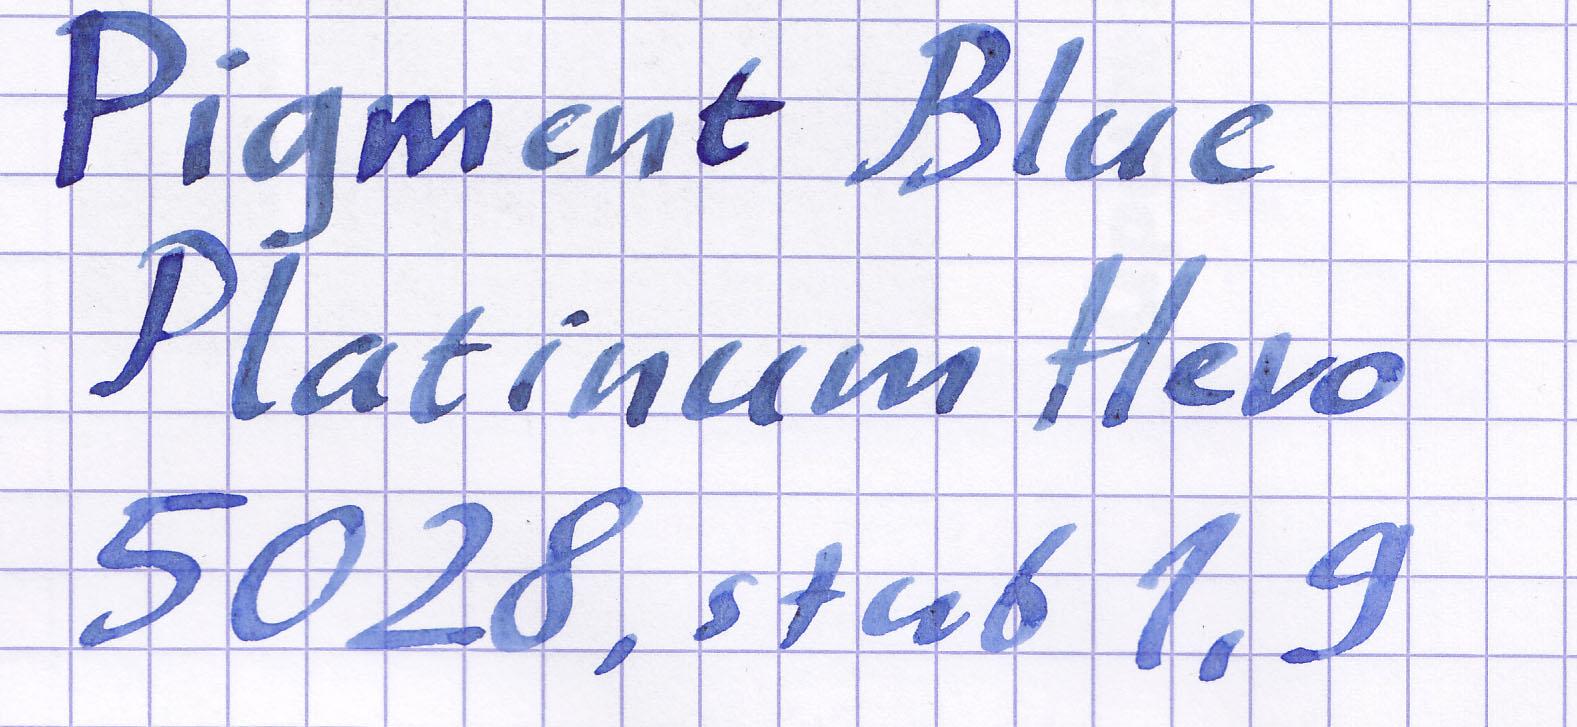 fpn_1467869247__blue_platinum_ox1.jpg